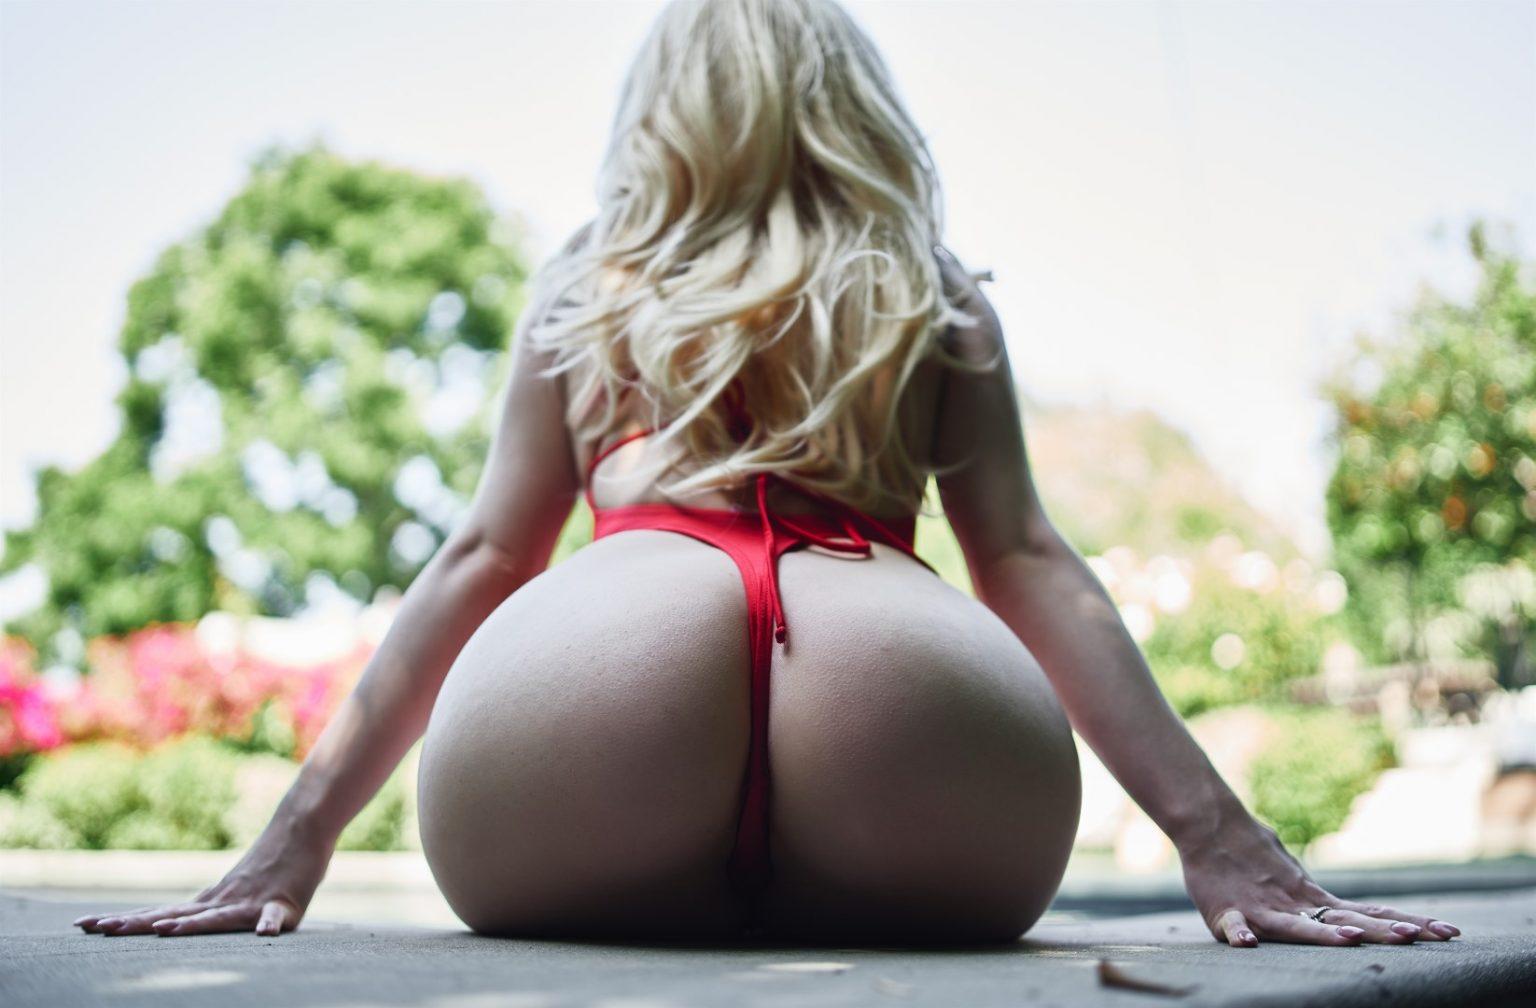 Jenna Lynn Meowri Leaked Nudes (164 Pics + 1 Video